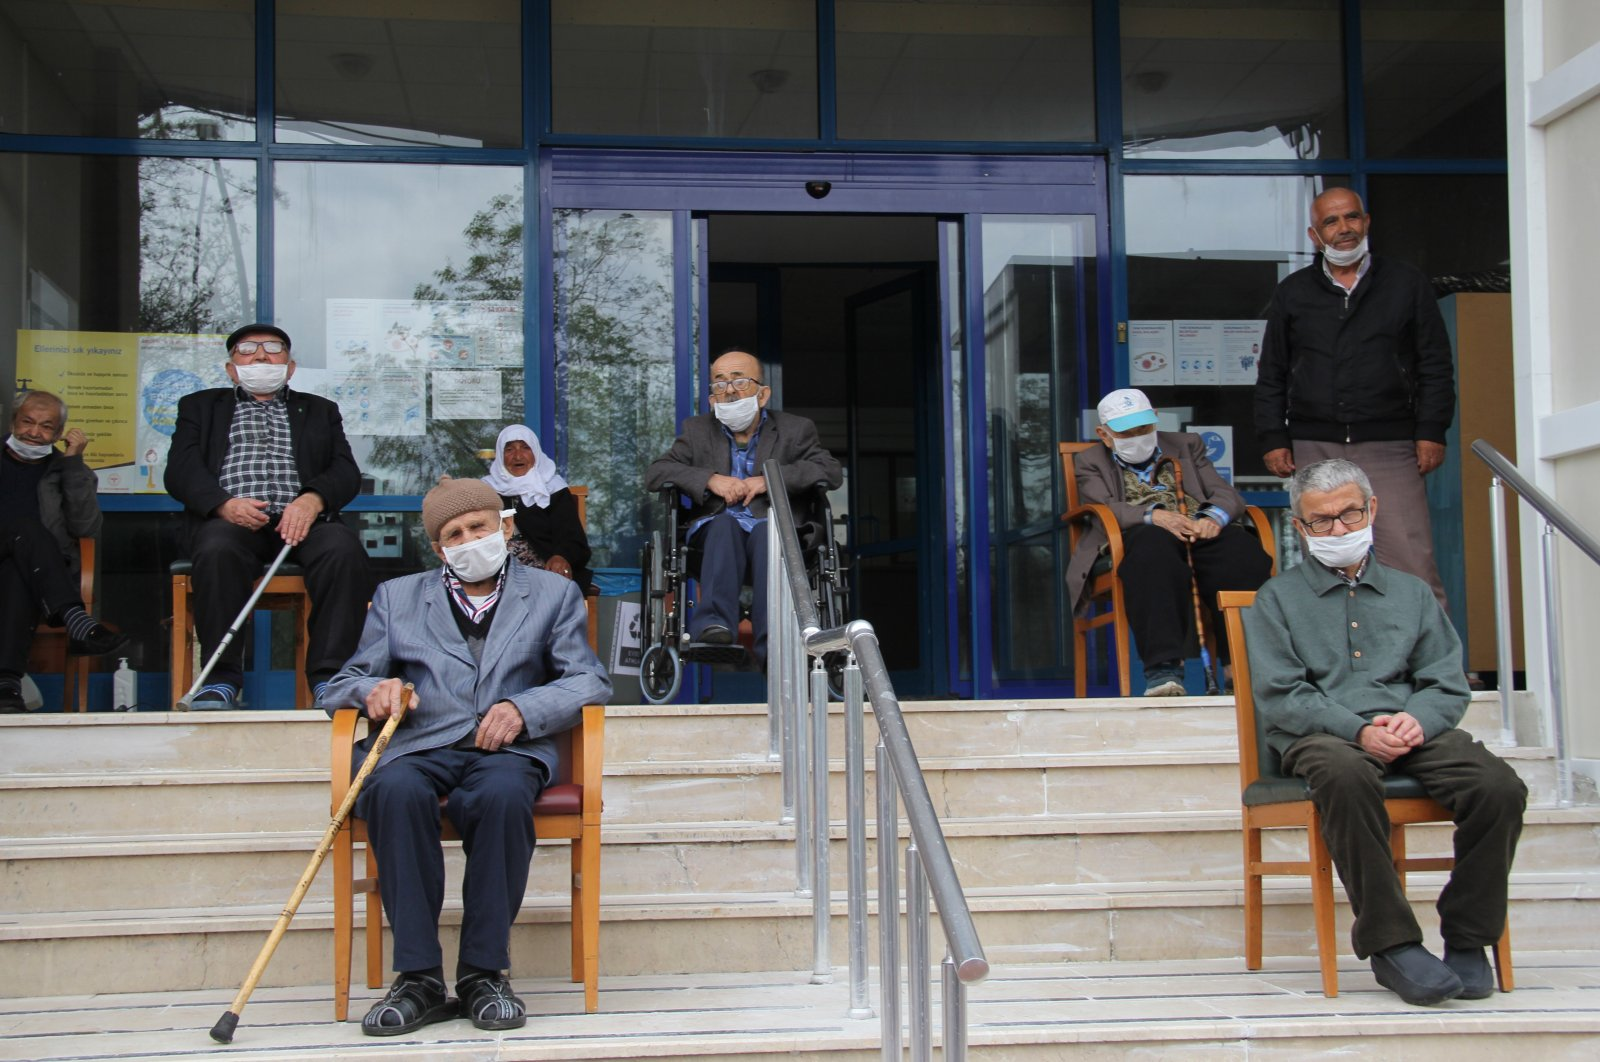 A group of nursing home residents wearing masks watch a concert in the courtyard, Karabük, Turkey, April 27, 2020. (İHA Photo)